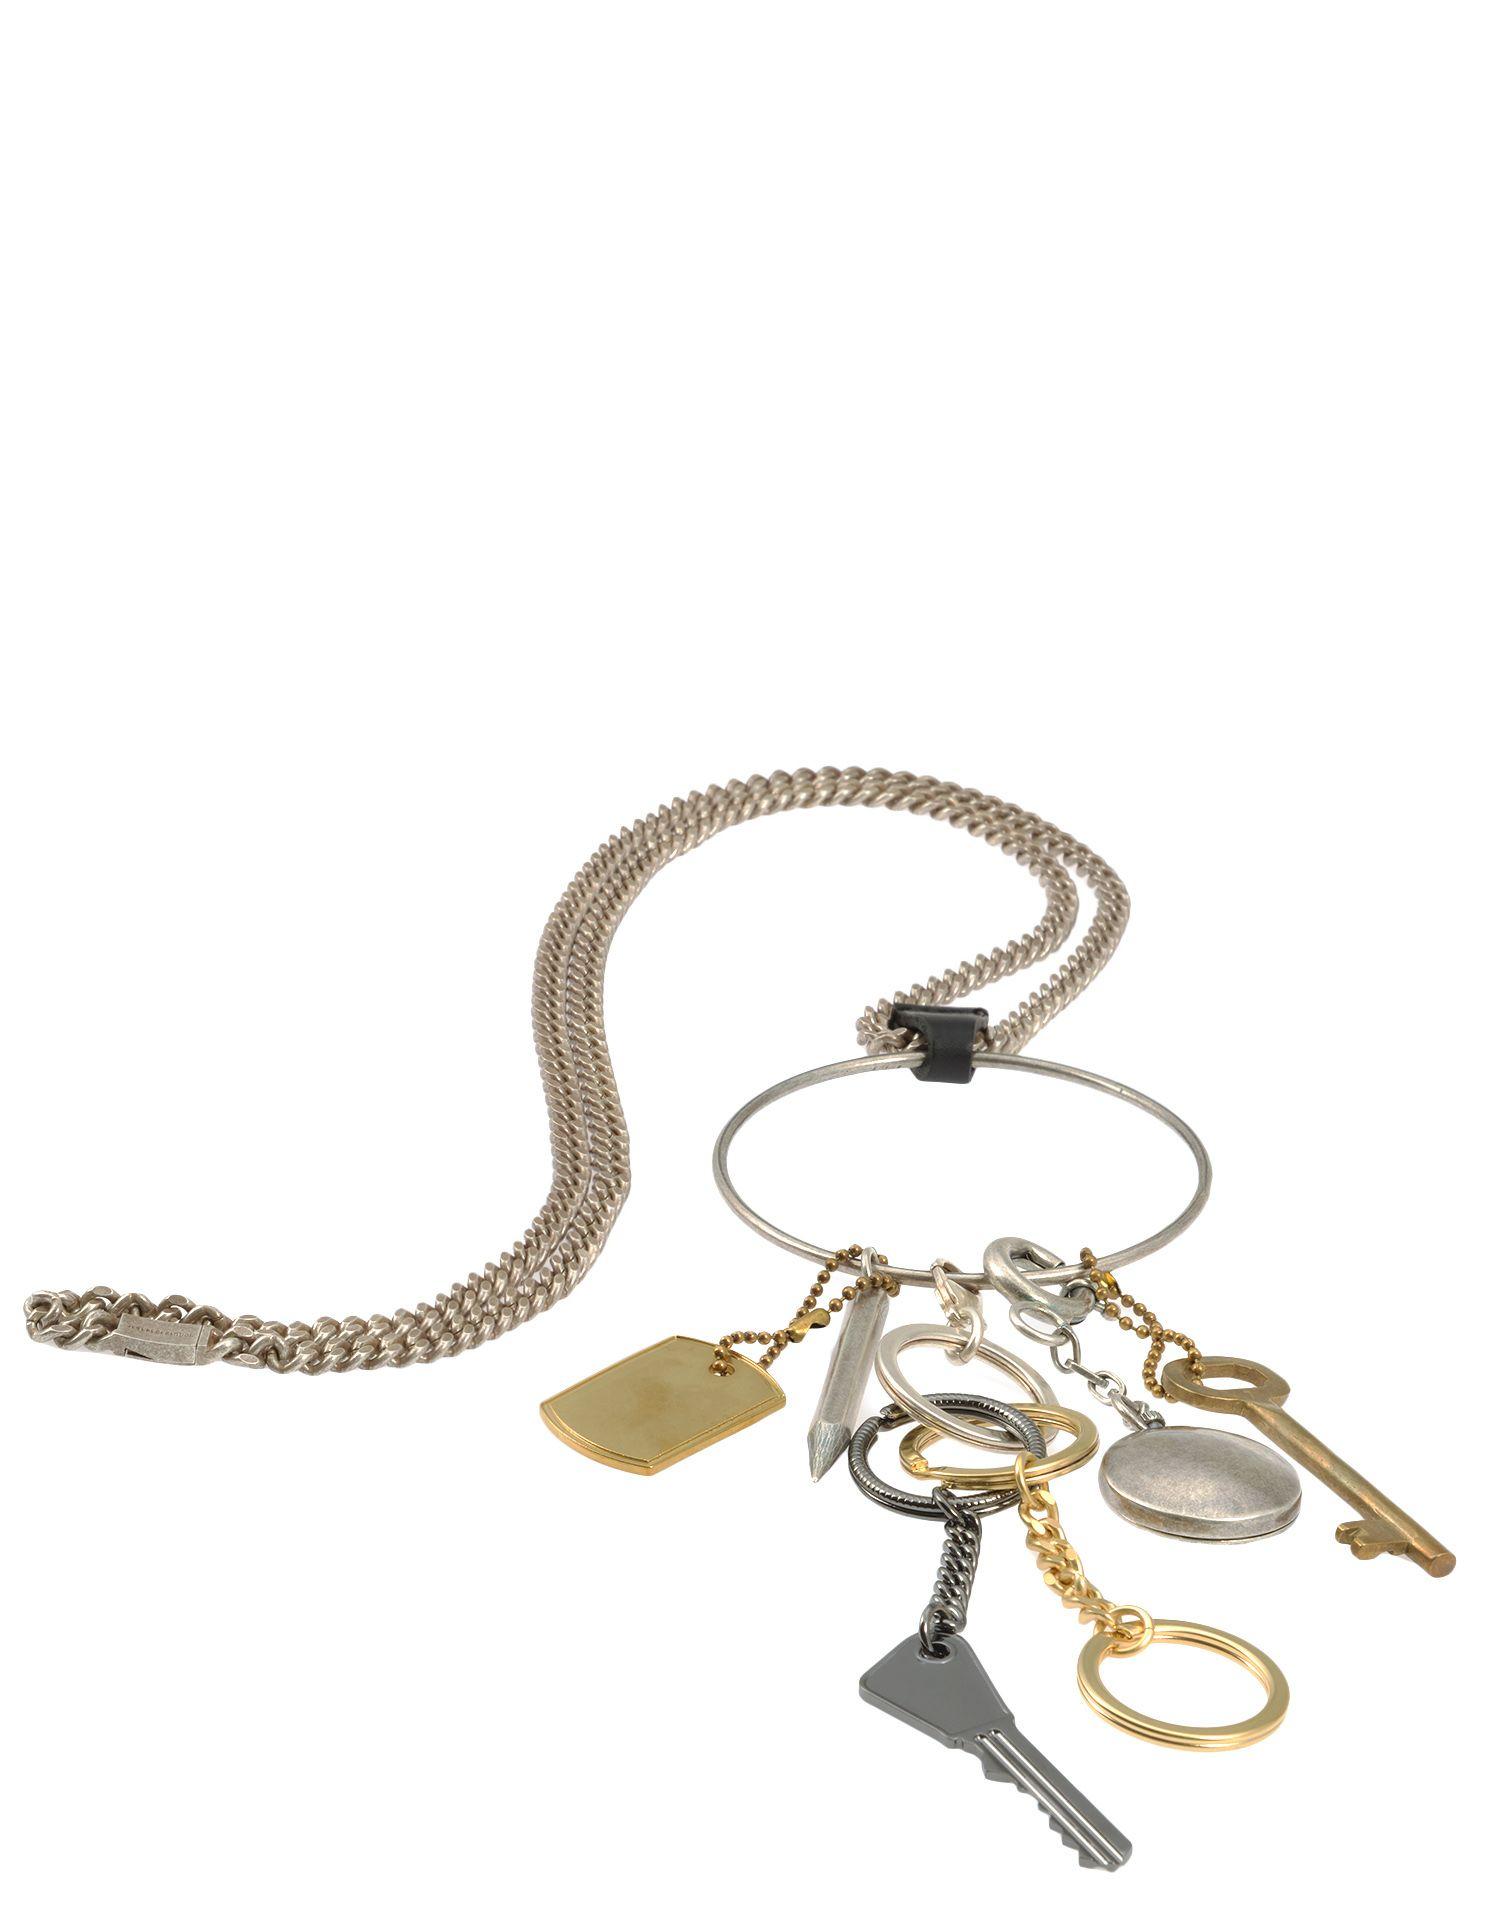 Maison Margiela Brass Necklace